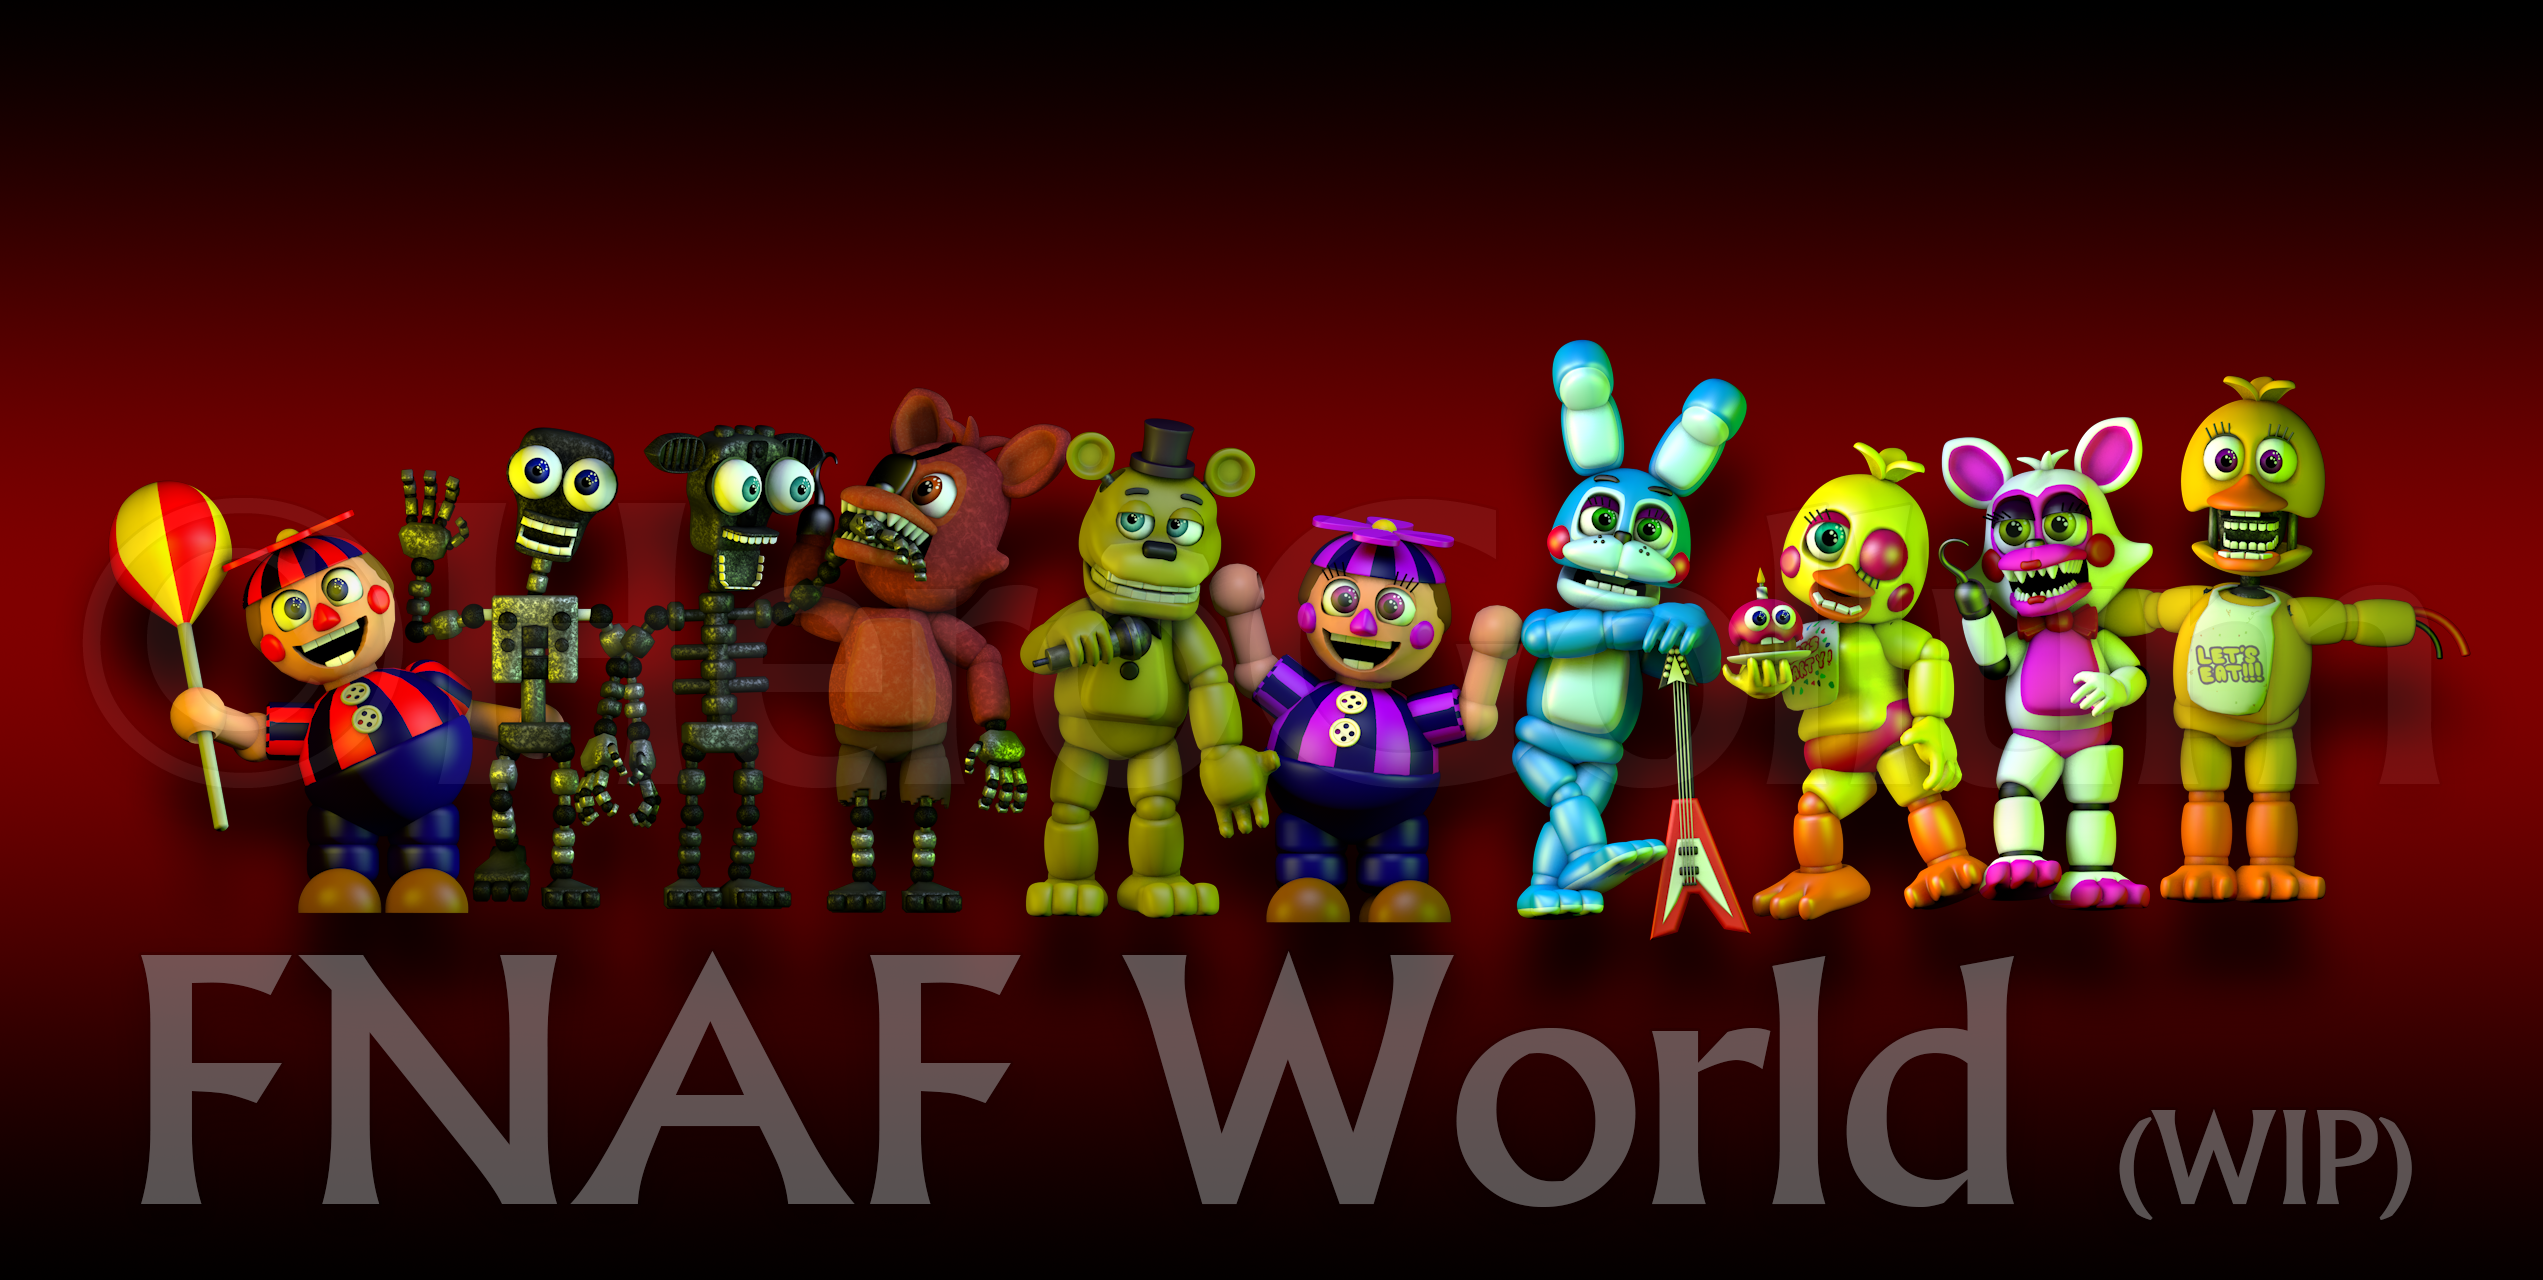 Fnaf World Wallpapers Wallpapersafari